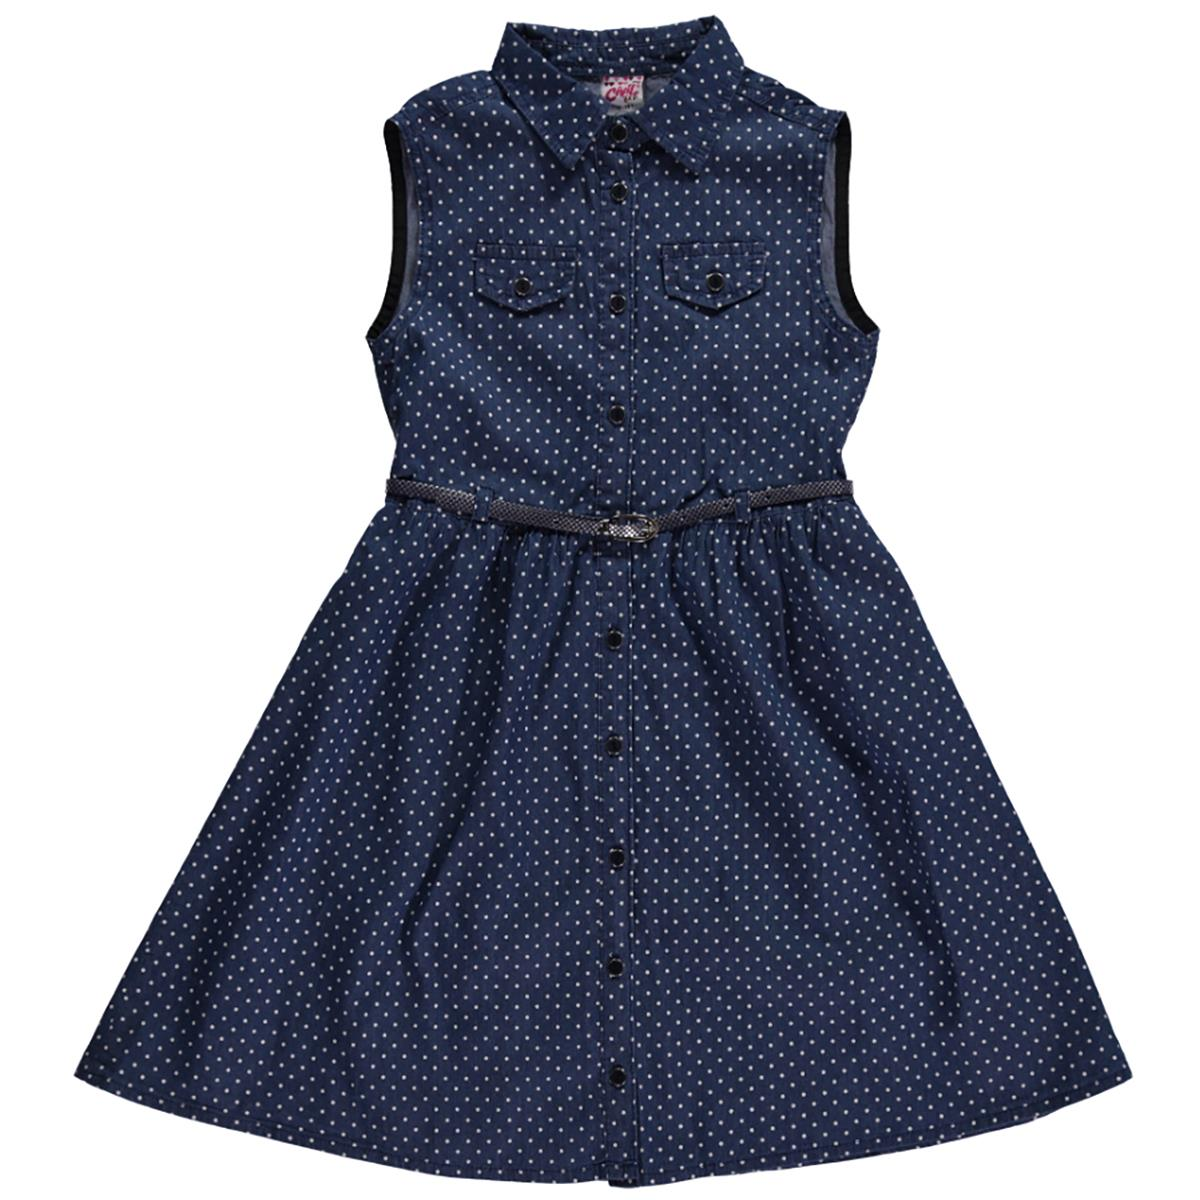 ba3ab1e259b38 655 / BYZ Civil Girls Kız Çocuk Kot Elbise 10-13 Yaş Beyaz